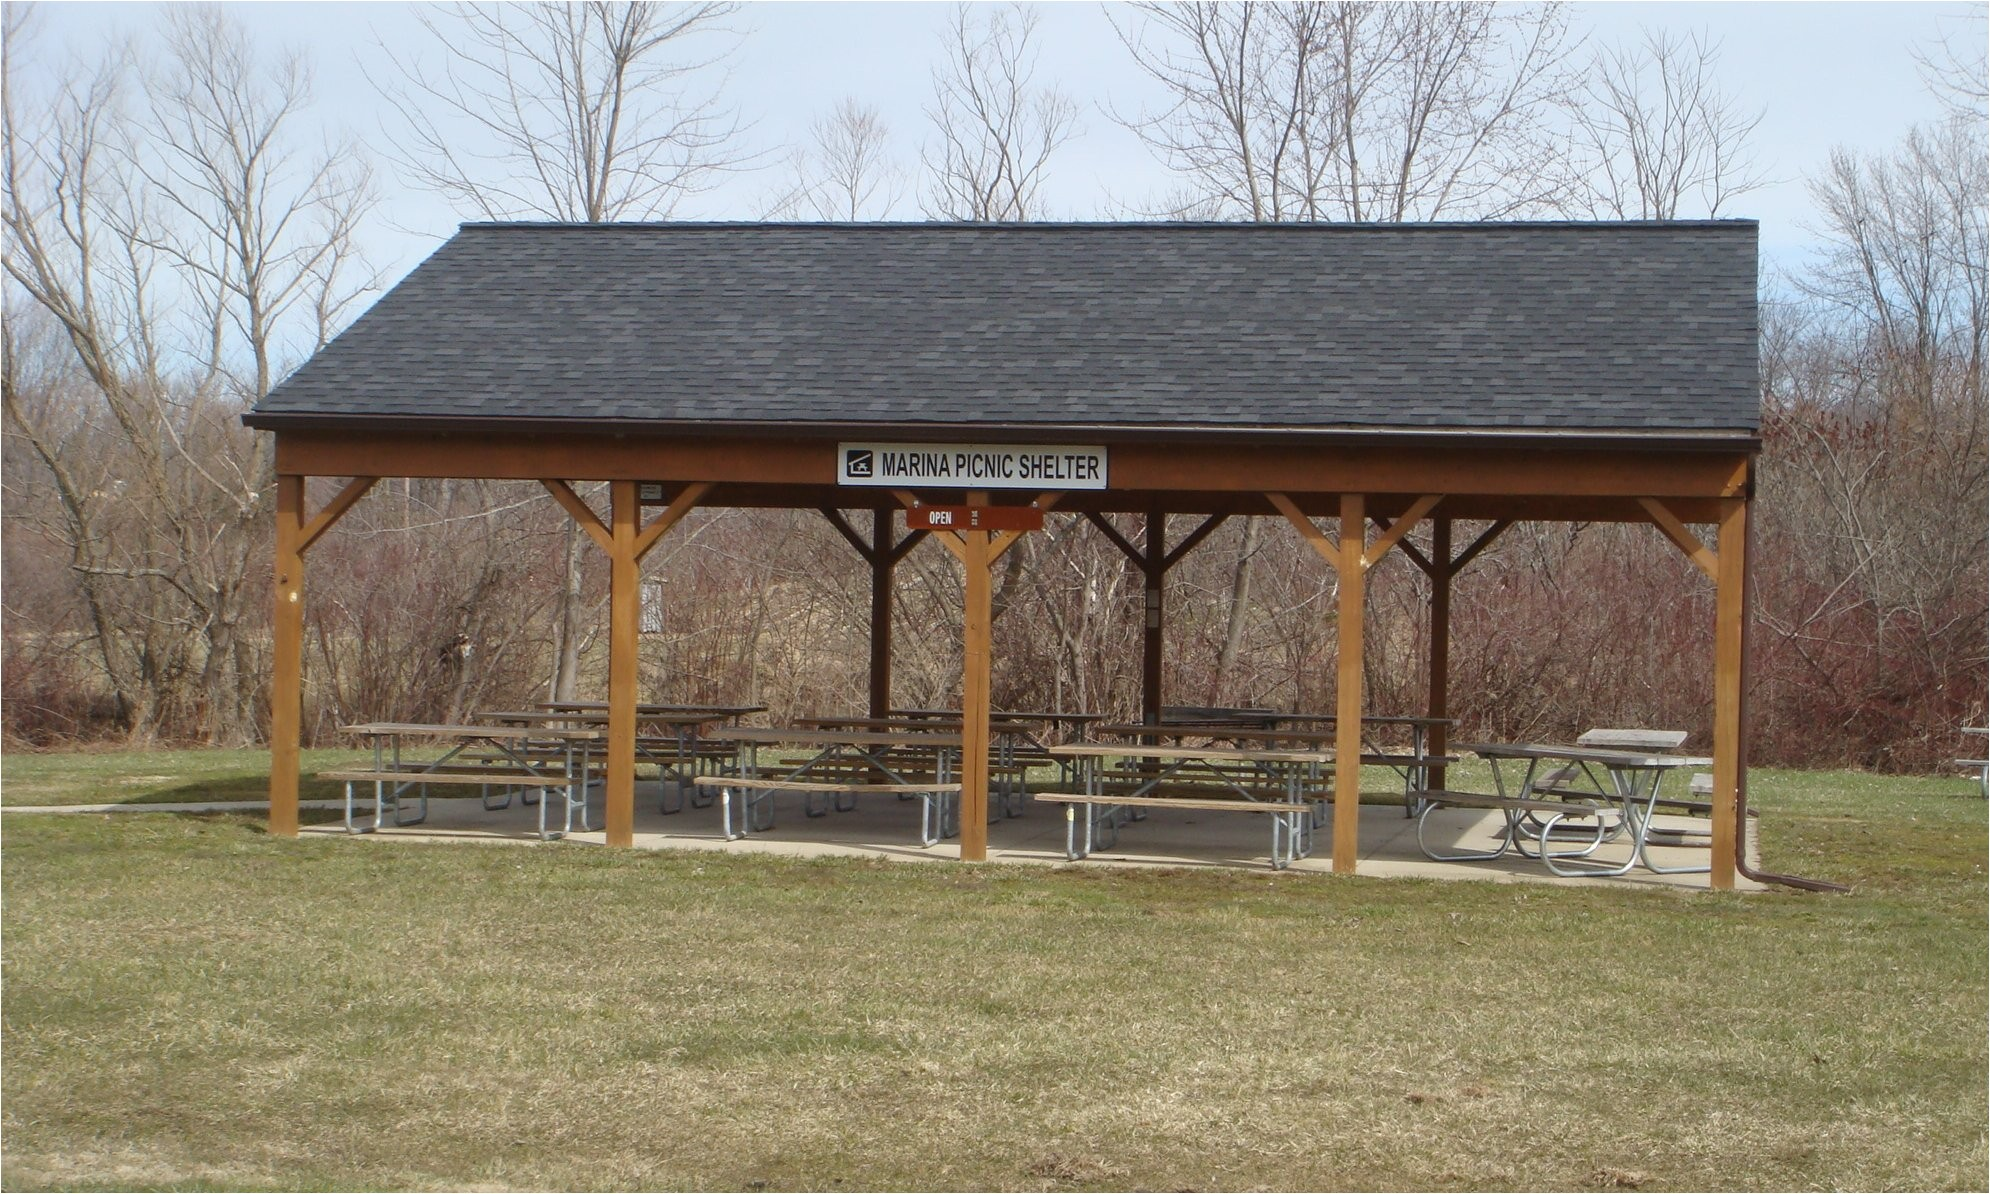 2740 diy plans picnic shelter house plans pdf download patterns furniture wolstanton